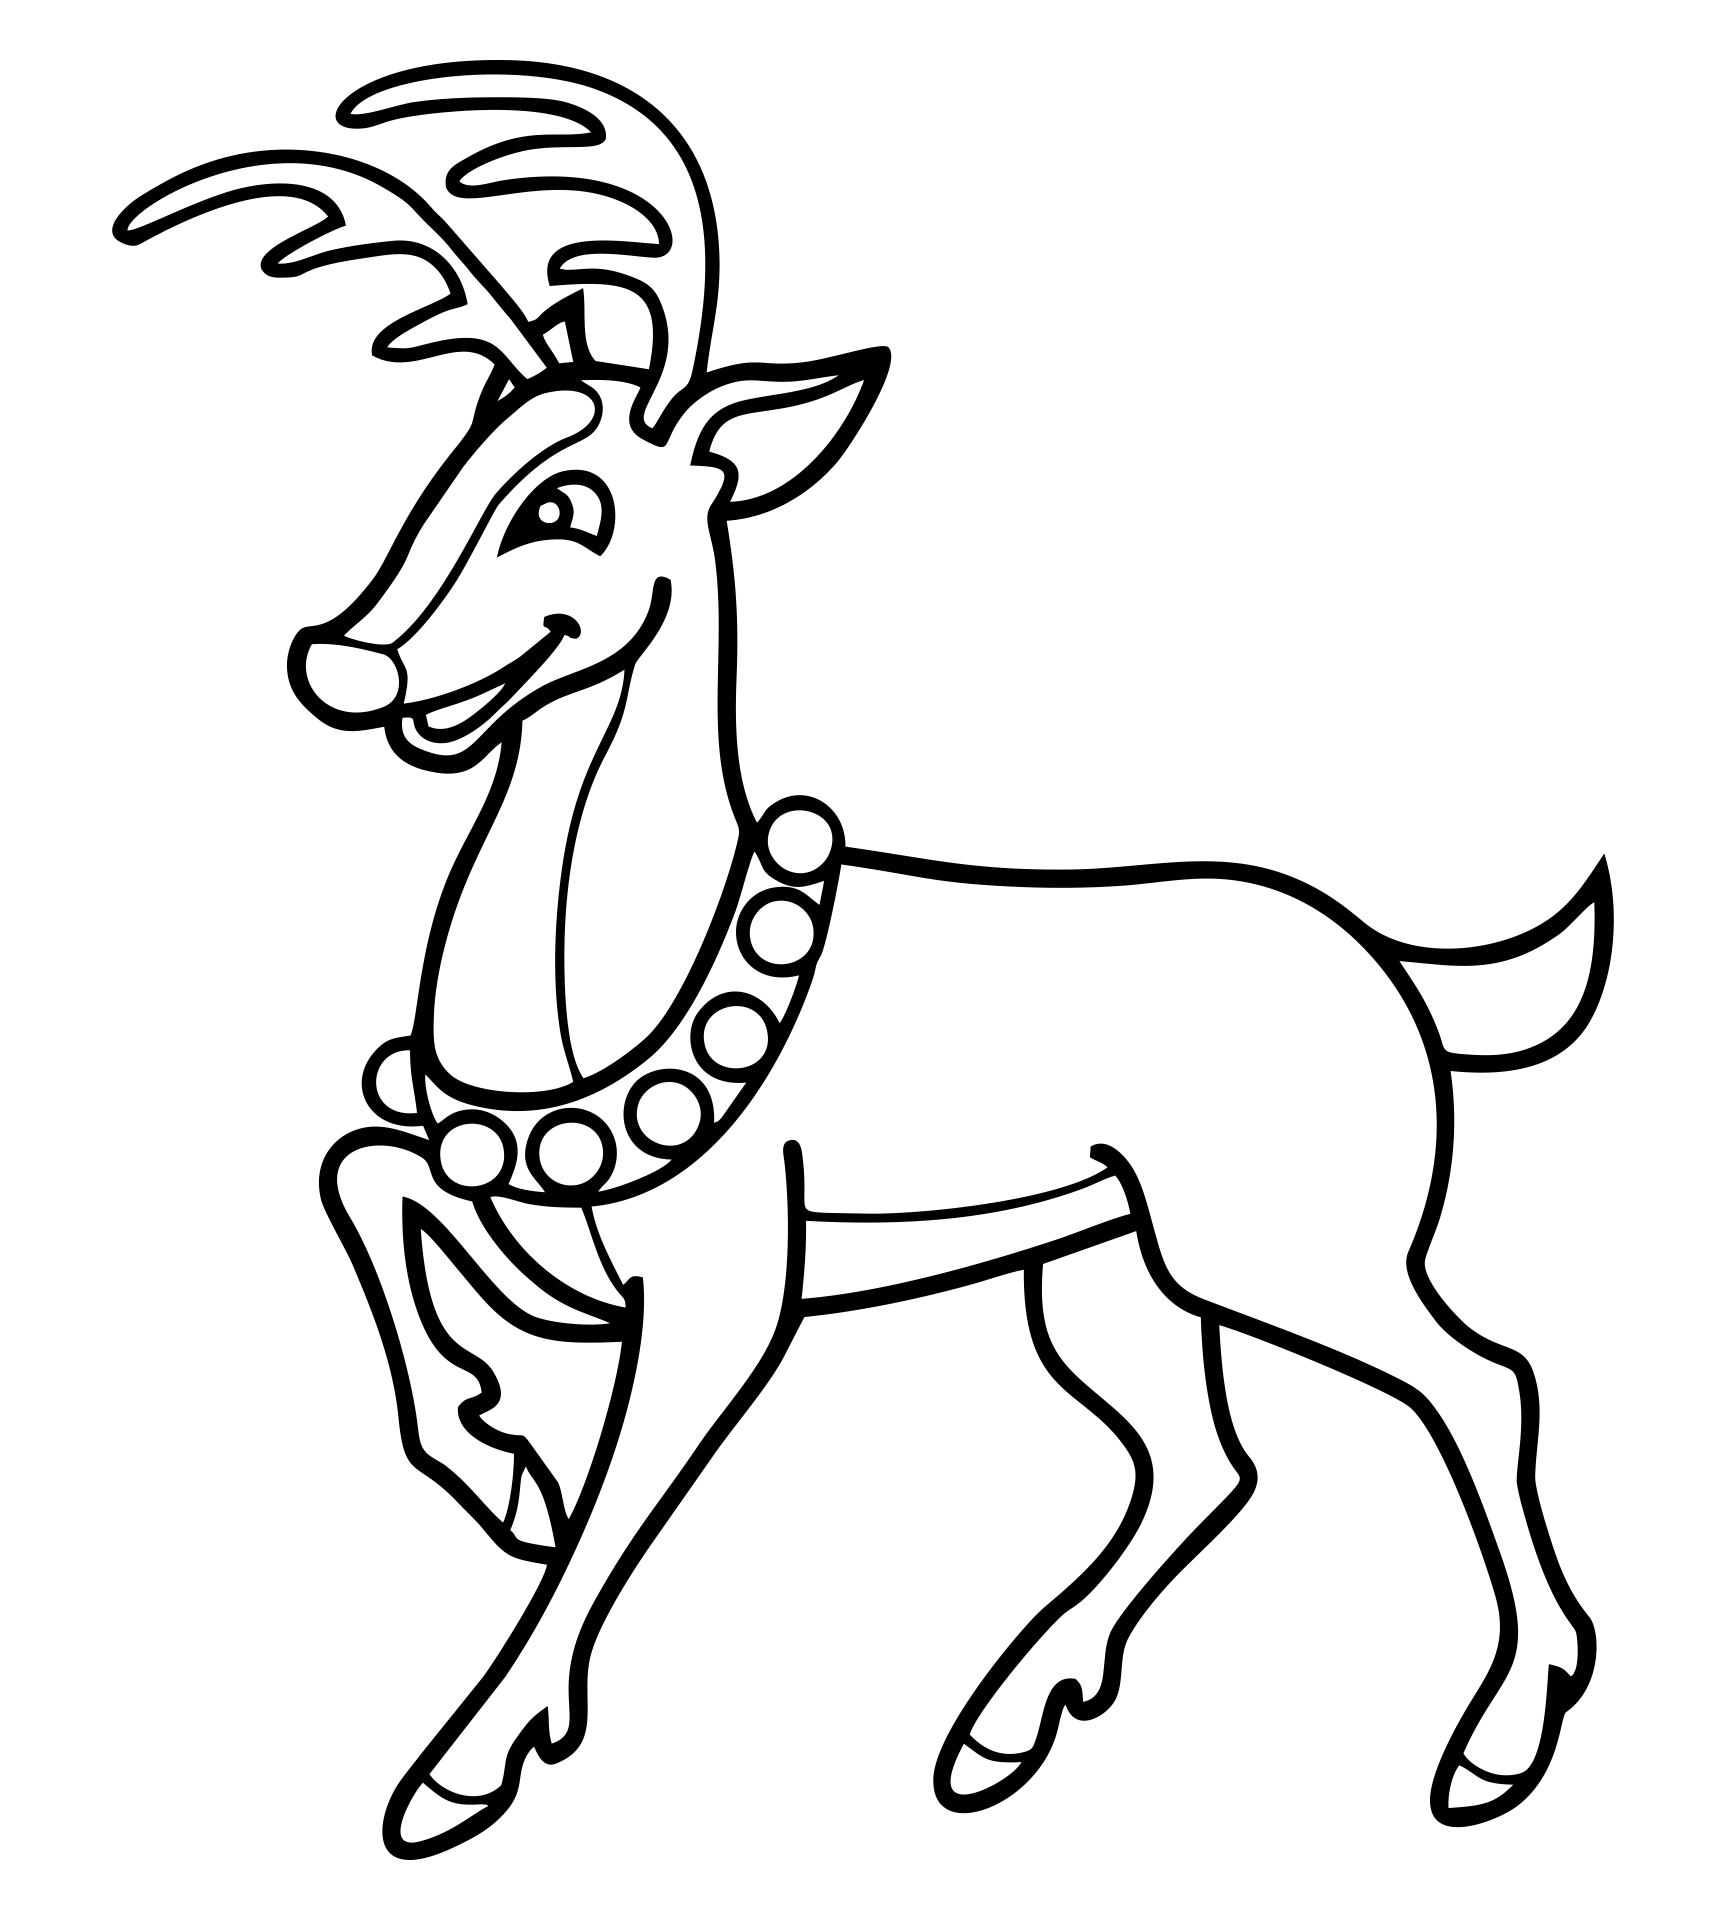 Reindeer Coloring Page Template